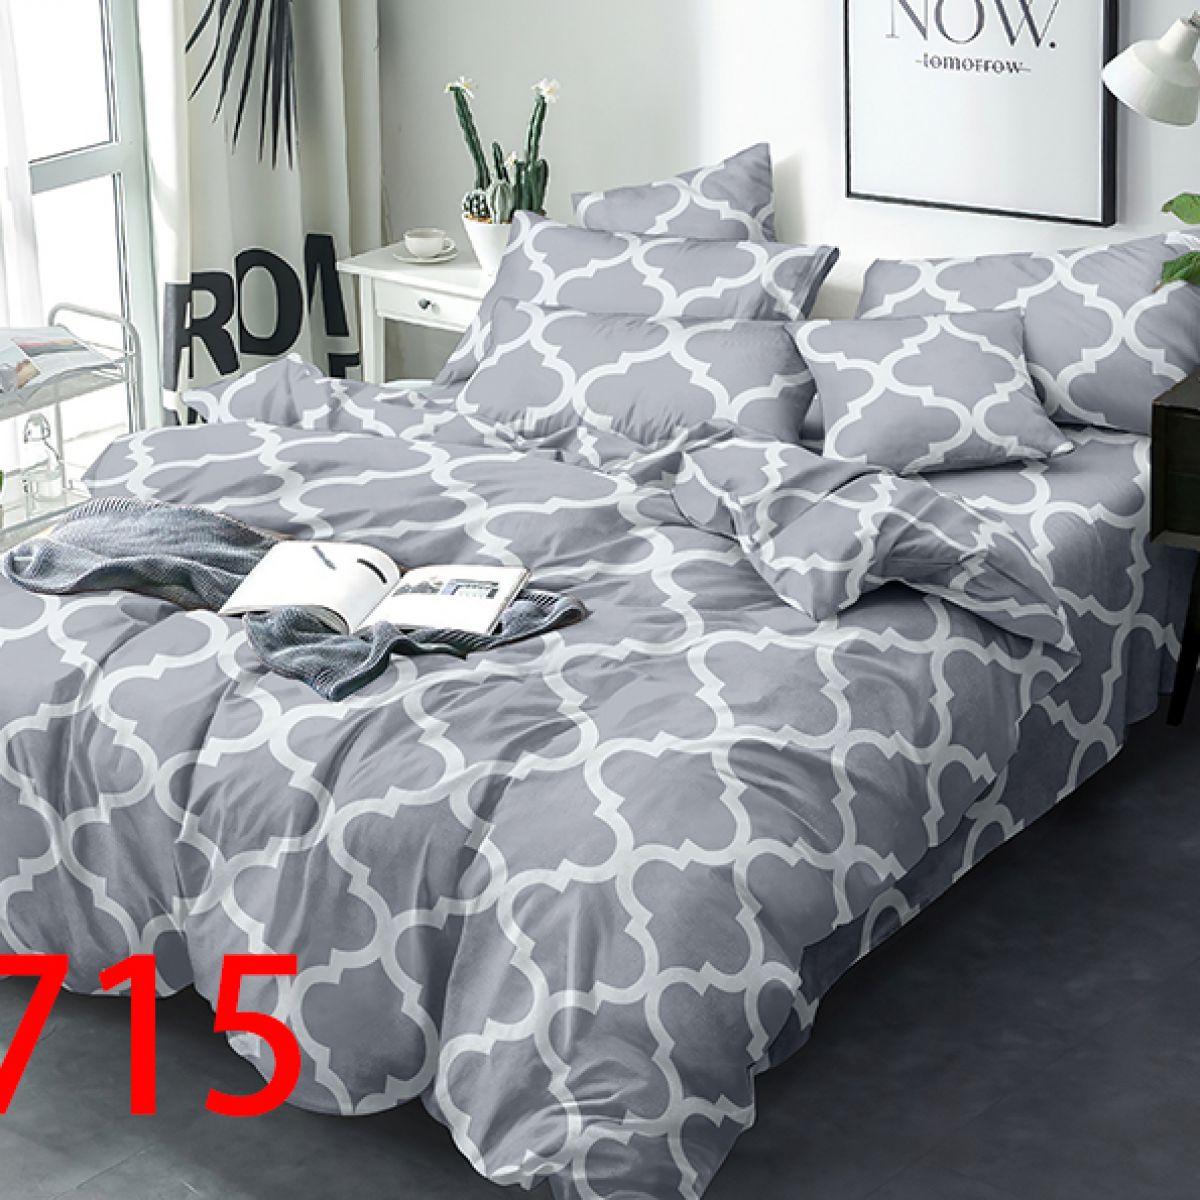 3D Beddings - Antonio - AML-4239-2 - 140x200 cm - 2 pcs